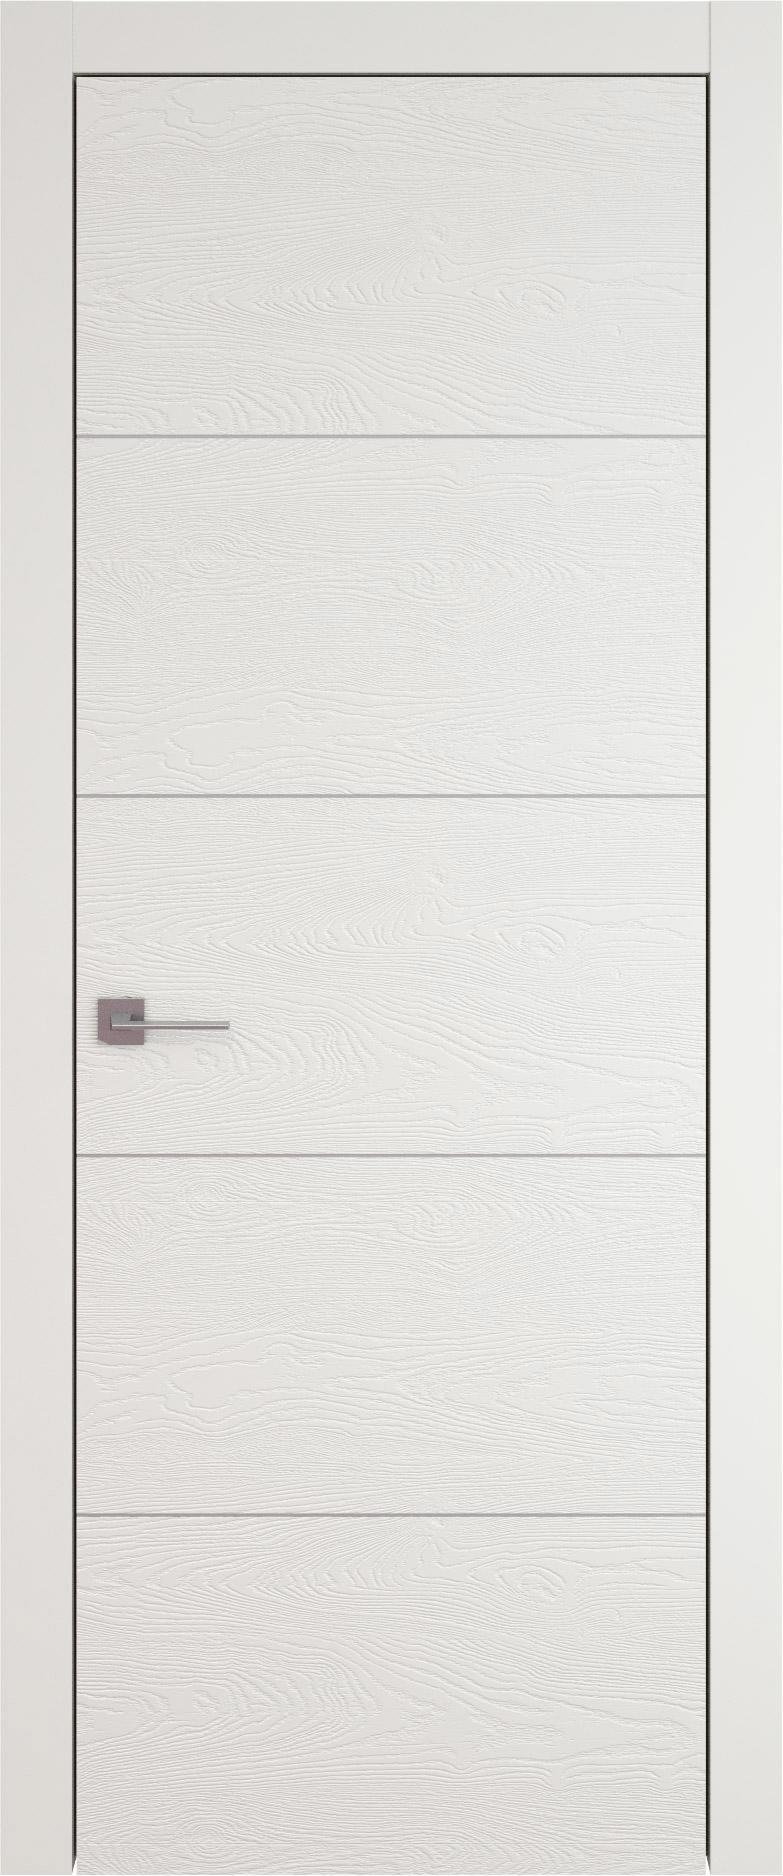 Tivoli Д-2 цвет - Бежевая эмаль по шпону (RAL 9010) Без стекла (ДГ)